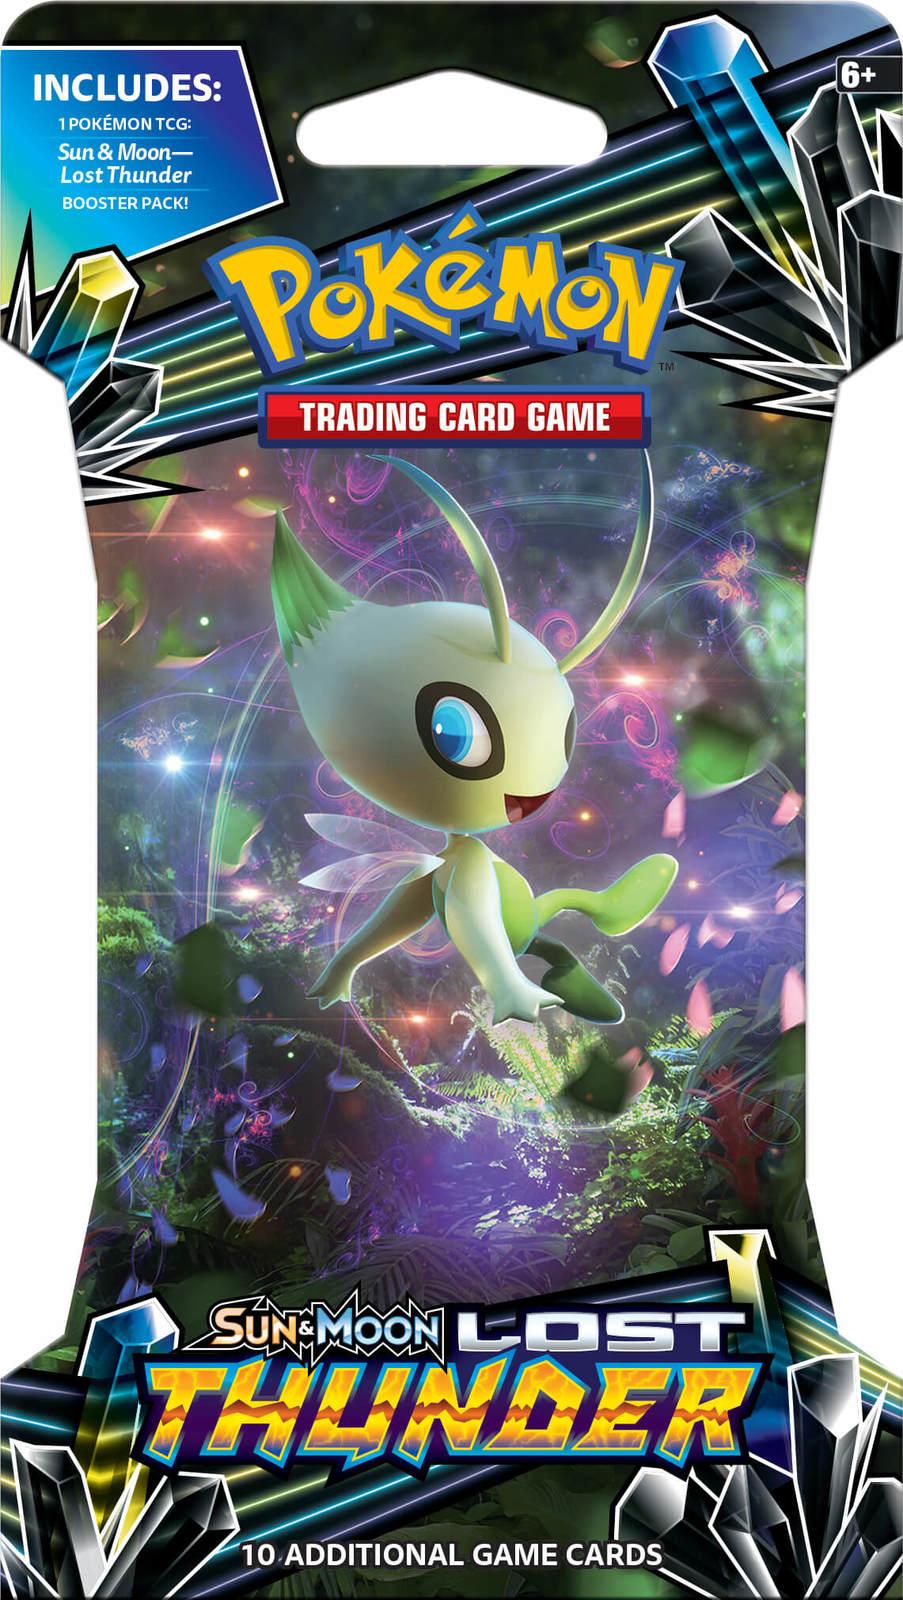 Pokemon TCG: Lost Thunder - Single Blister (10 Cards) image